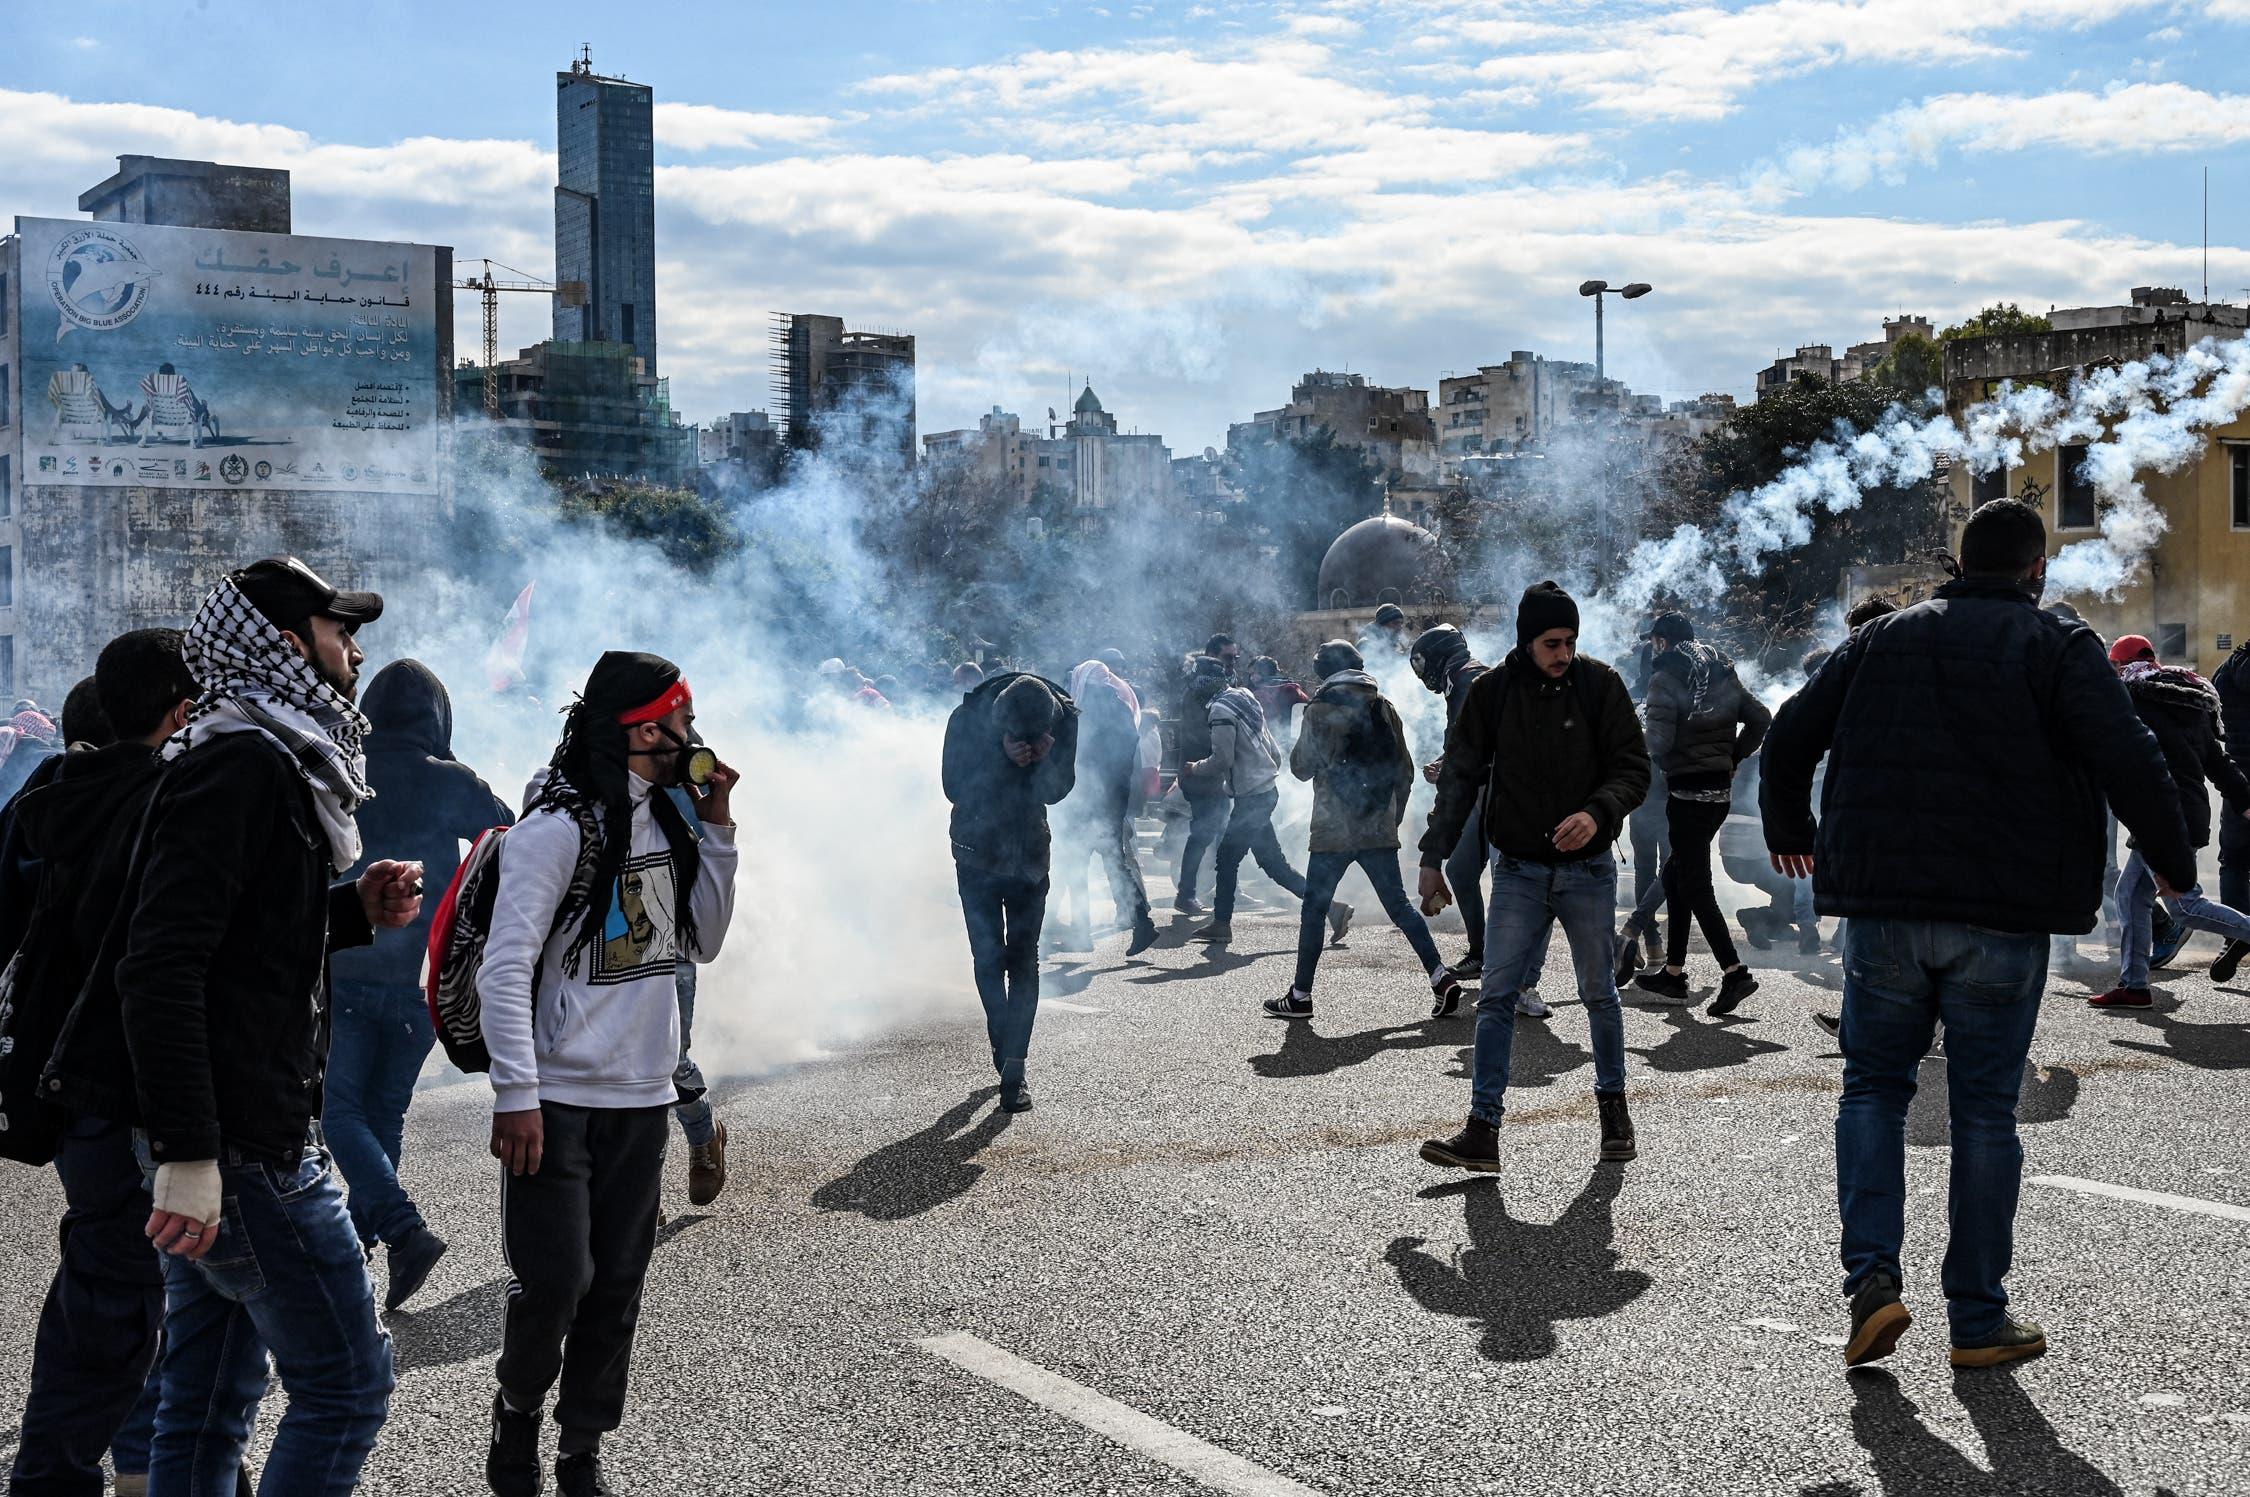 A protestor flees in incoming volley of tear gas. (Finbar Anderson)